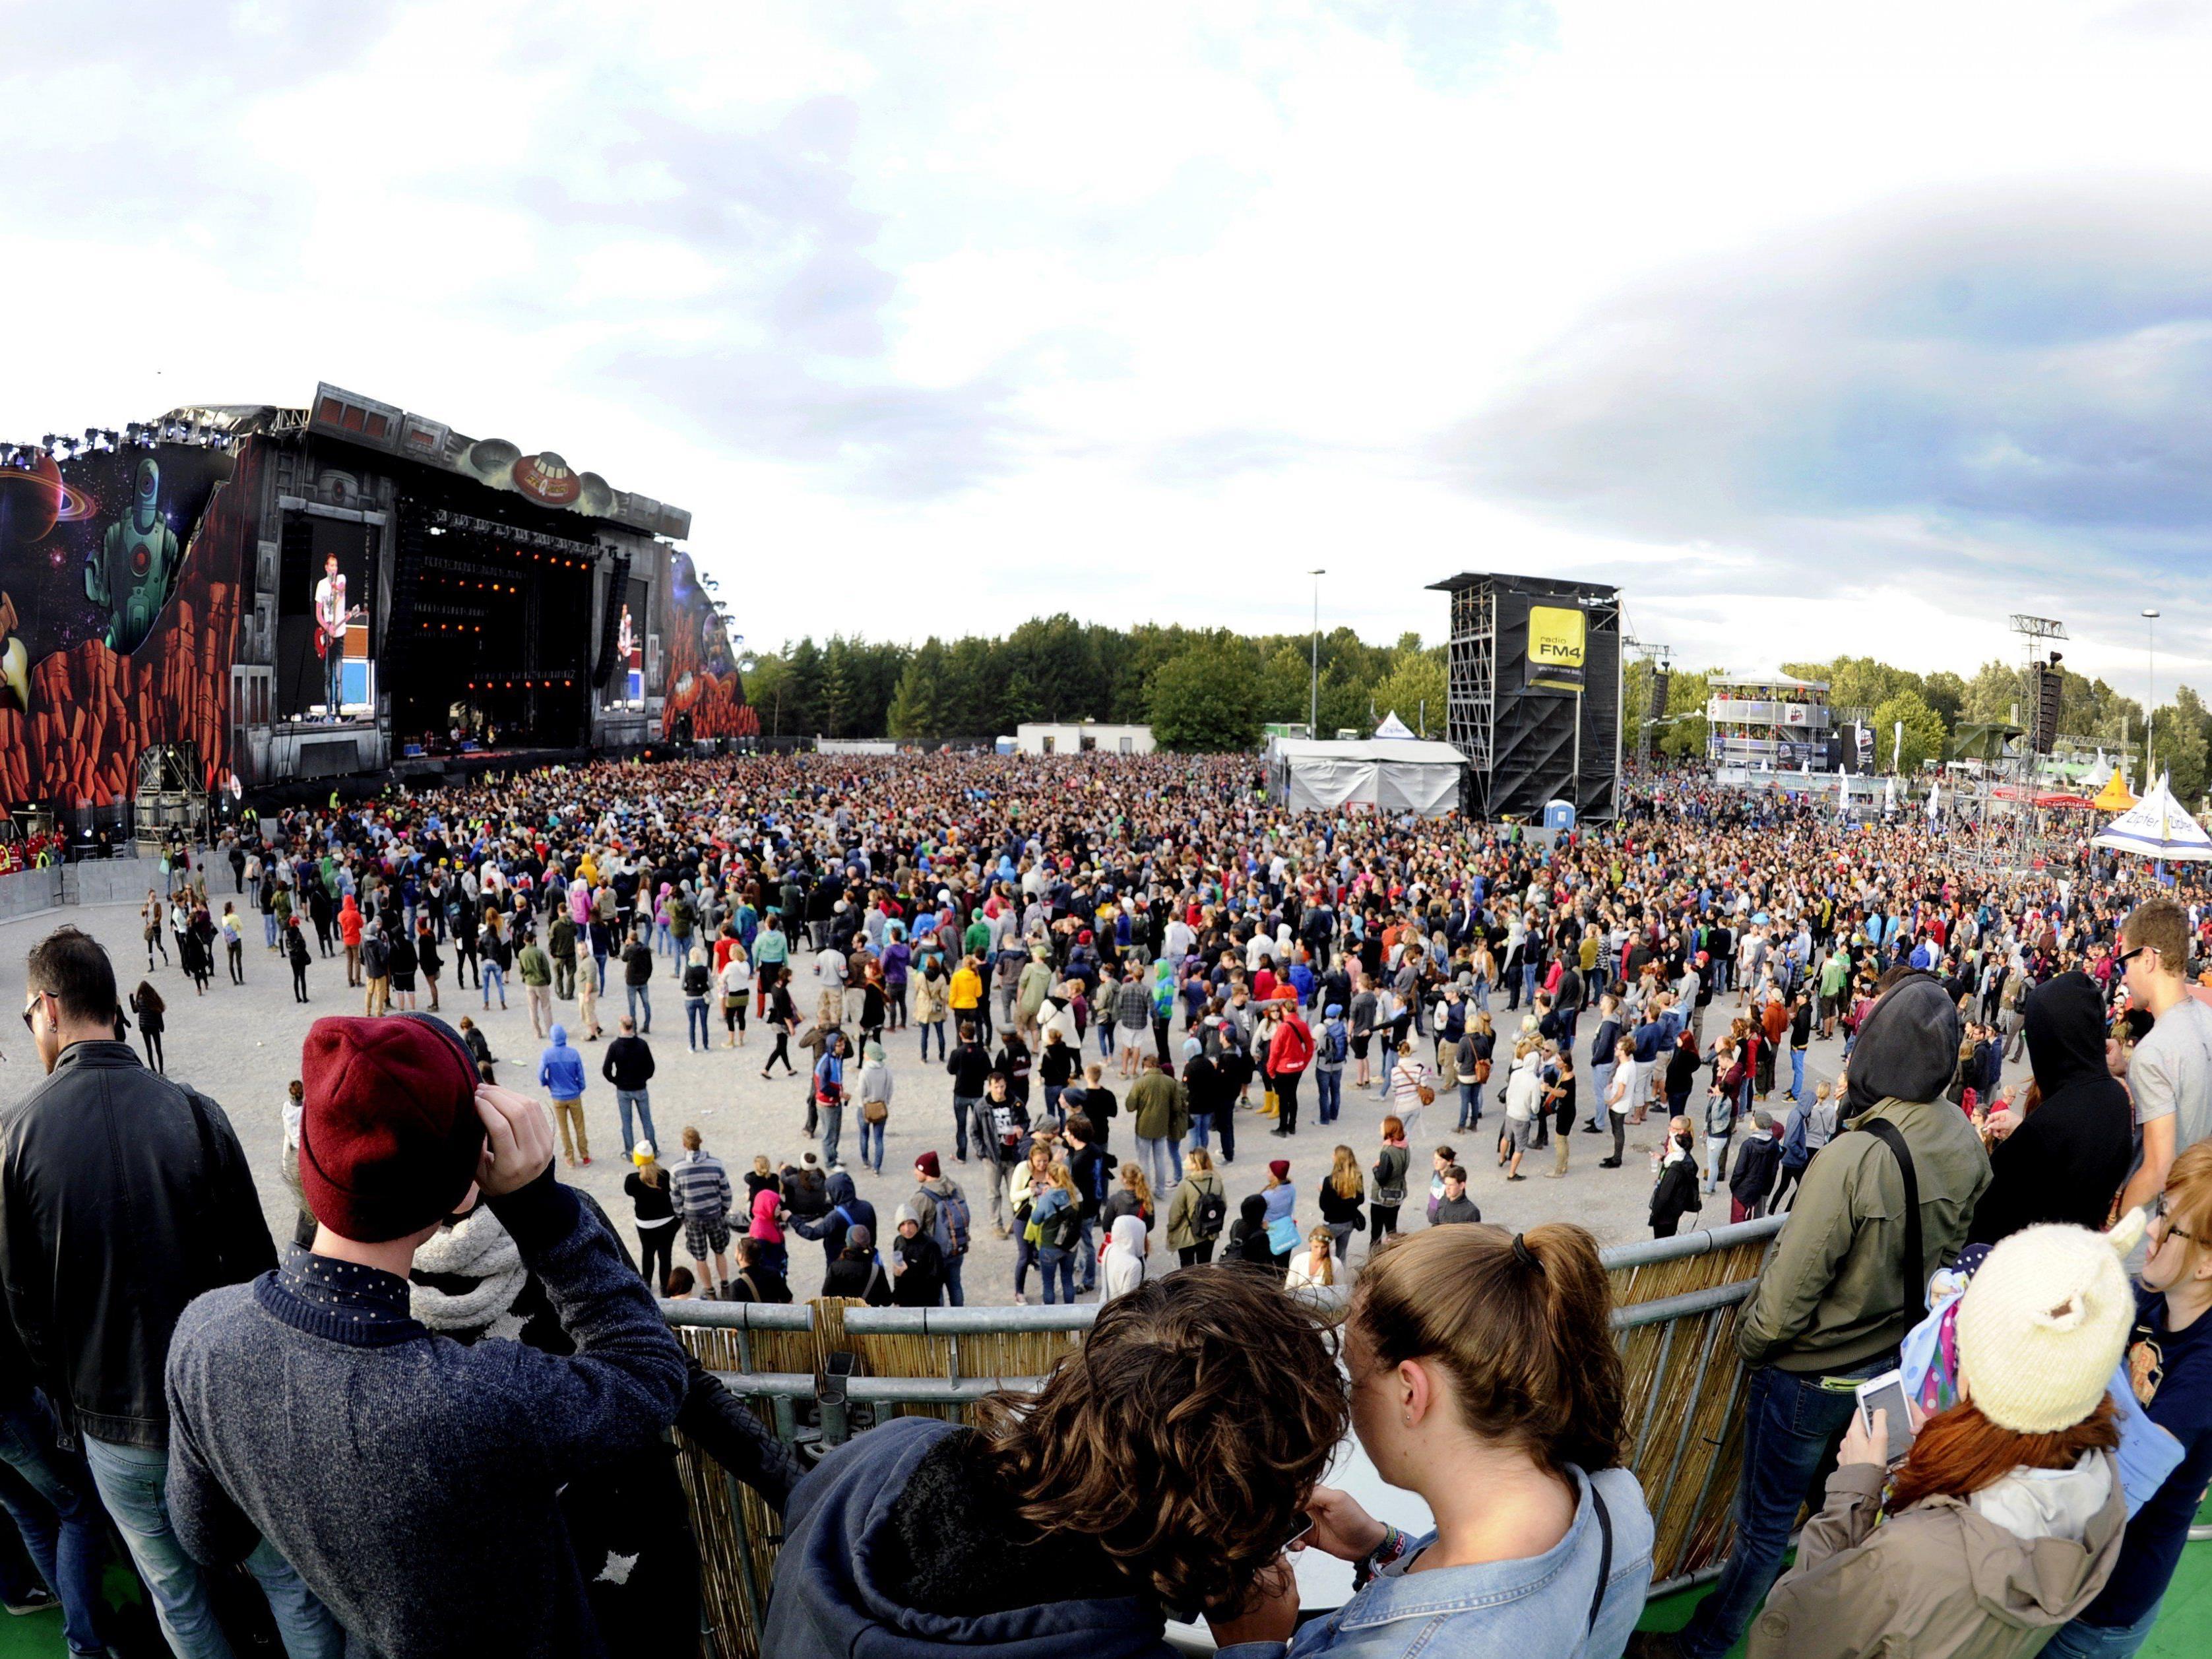 LIVE vom Frequency Festival 2015 - unser Social Media-Ticker.